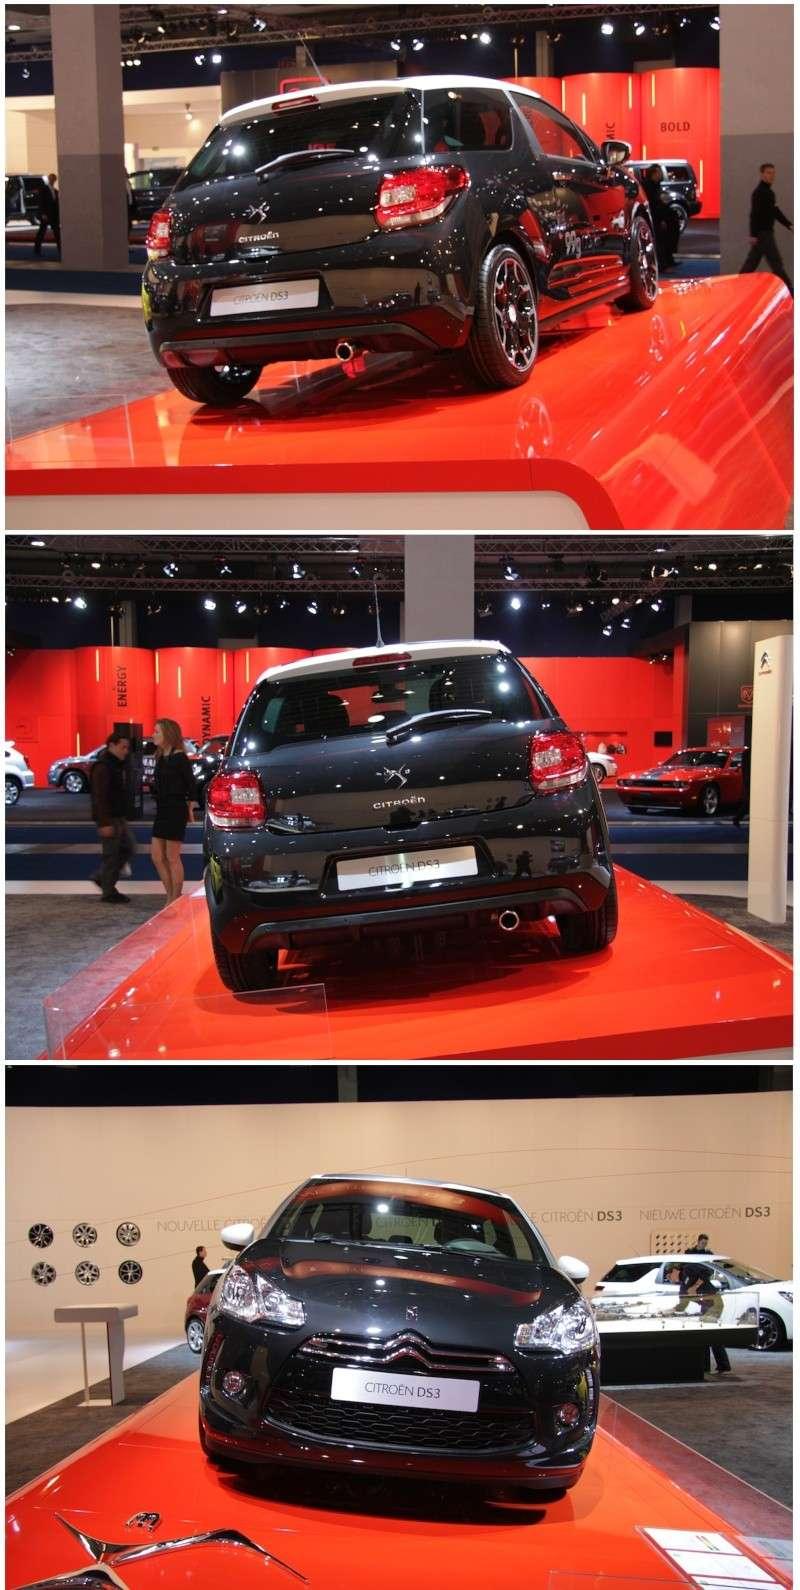 [SALON] Brussels 2010 - European Motor Show 210